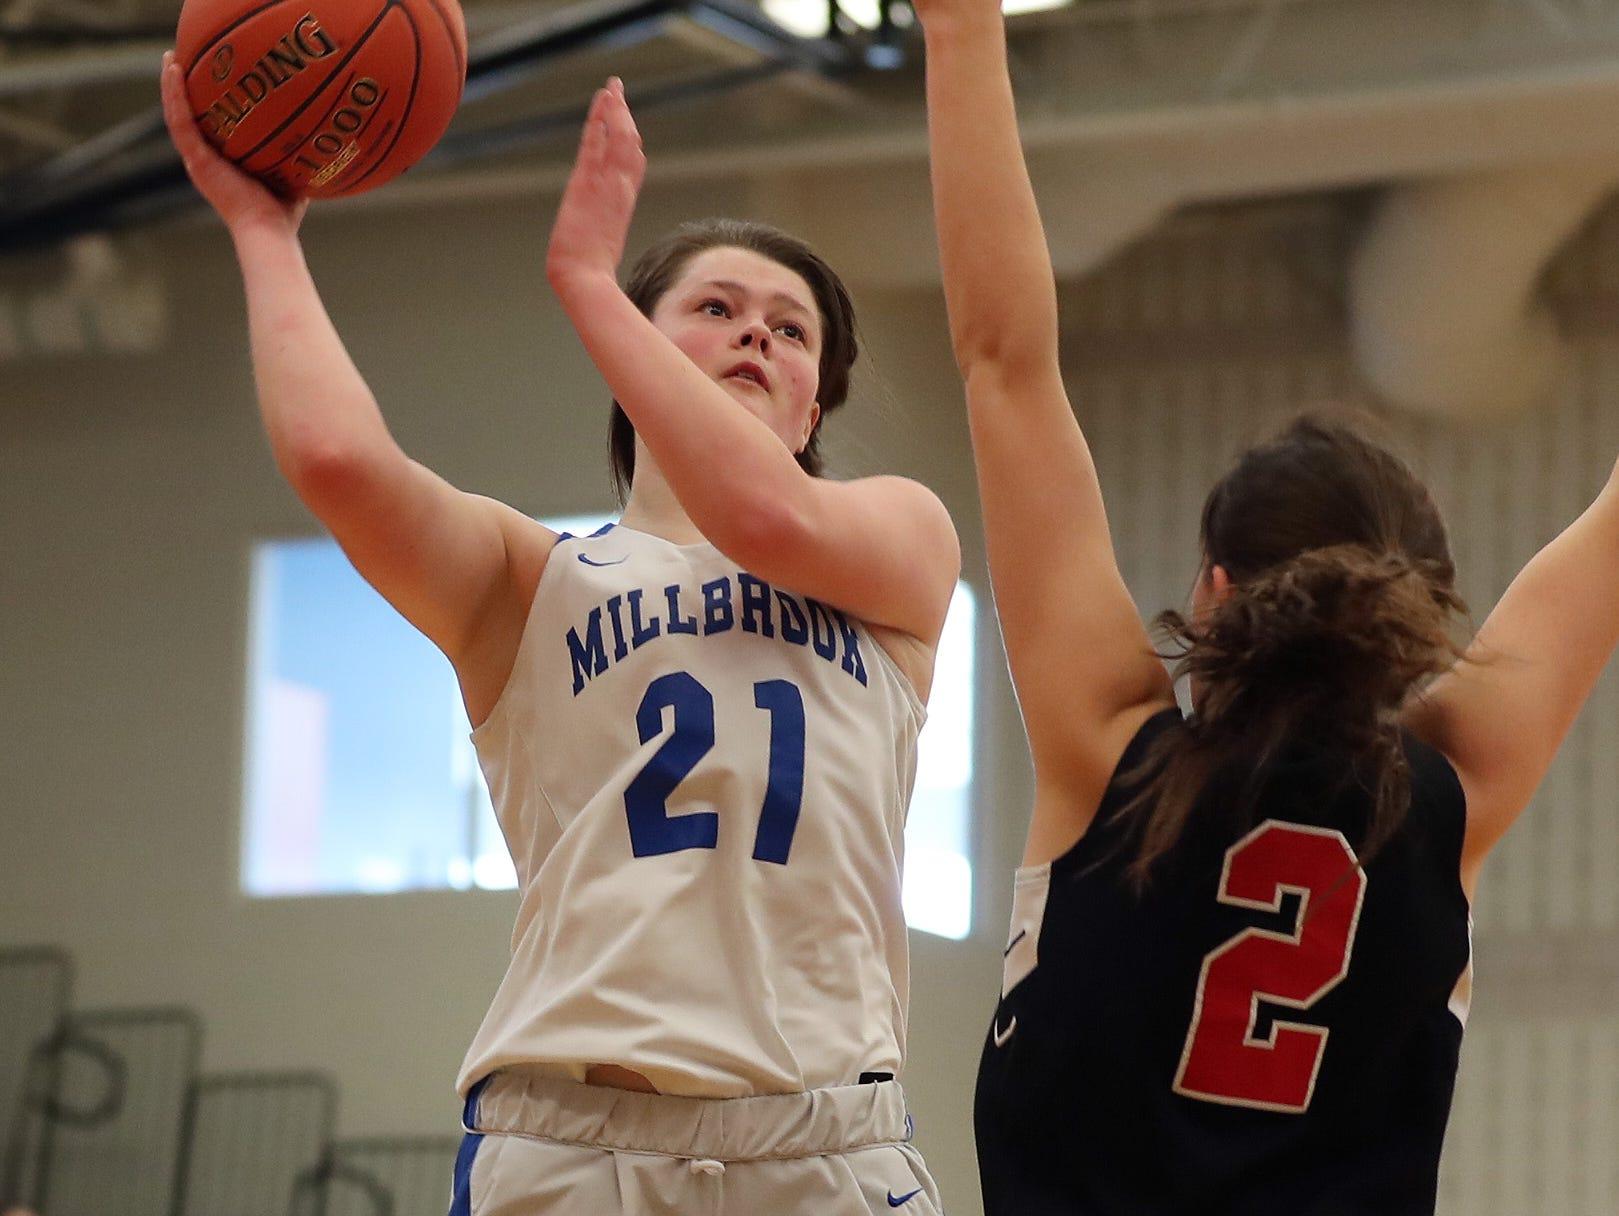 Millbrook's Erin Fox (21) puts up a shot against Pierson/Bridgehampton/Shelter Island during the girls regional final at SUNY New Paltz Match 9, 2019.